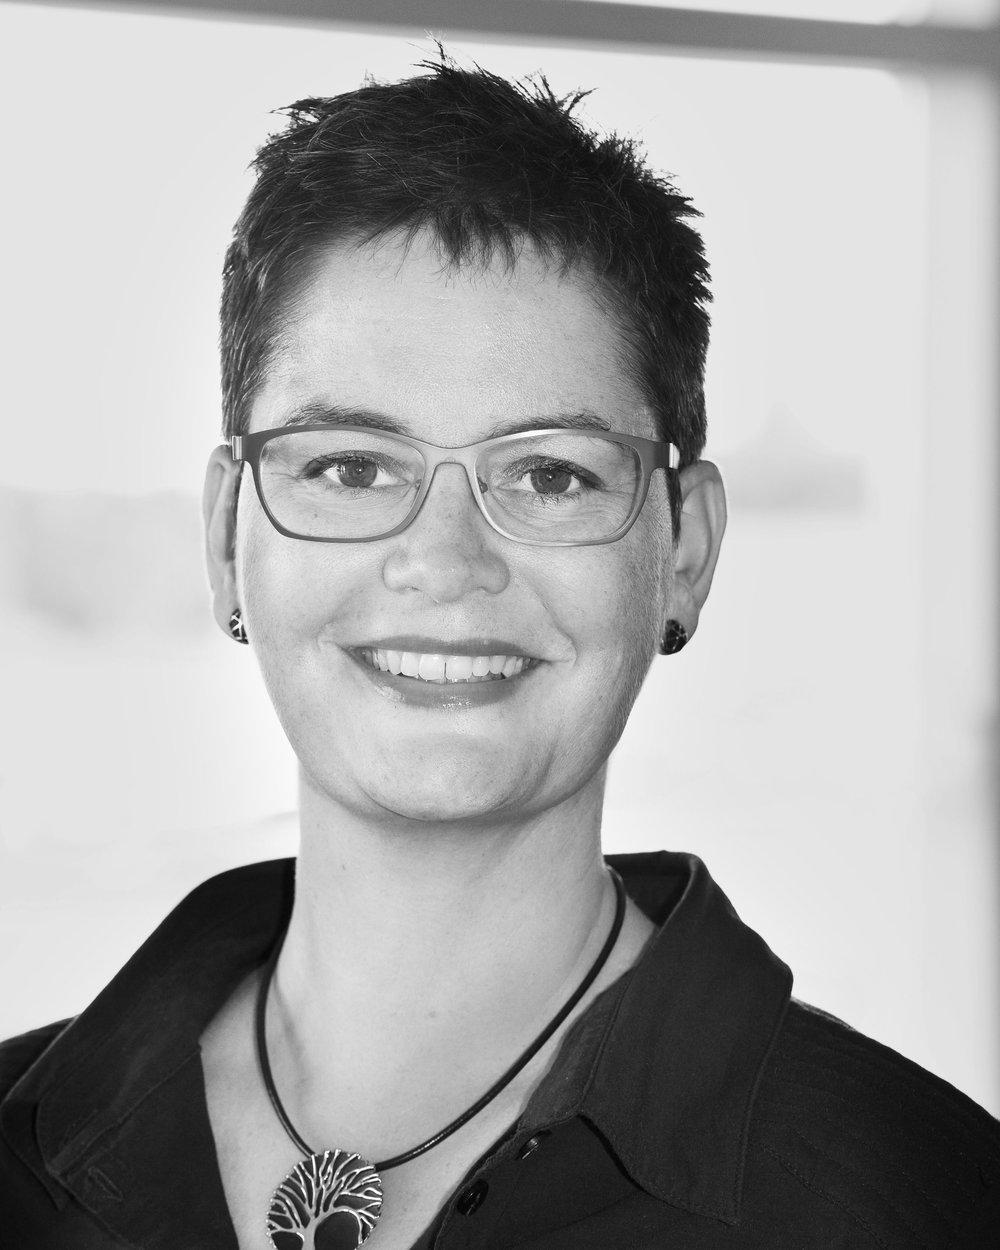 Sara Fevre Kindberg - Specialist Midwife, MHSc, PhD+45 5125 0503sara@hegenbergerspeculum.com